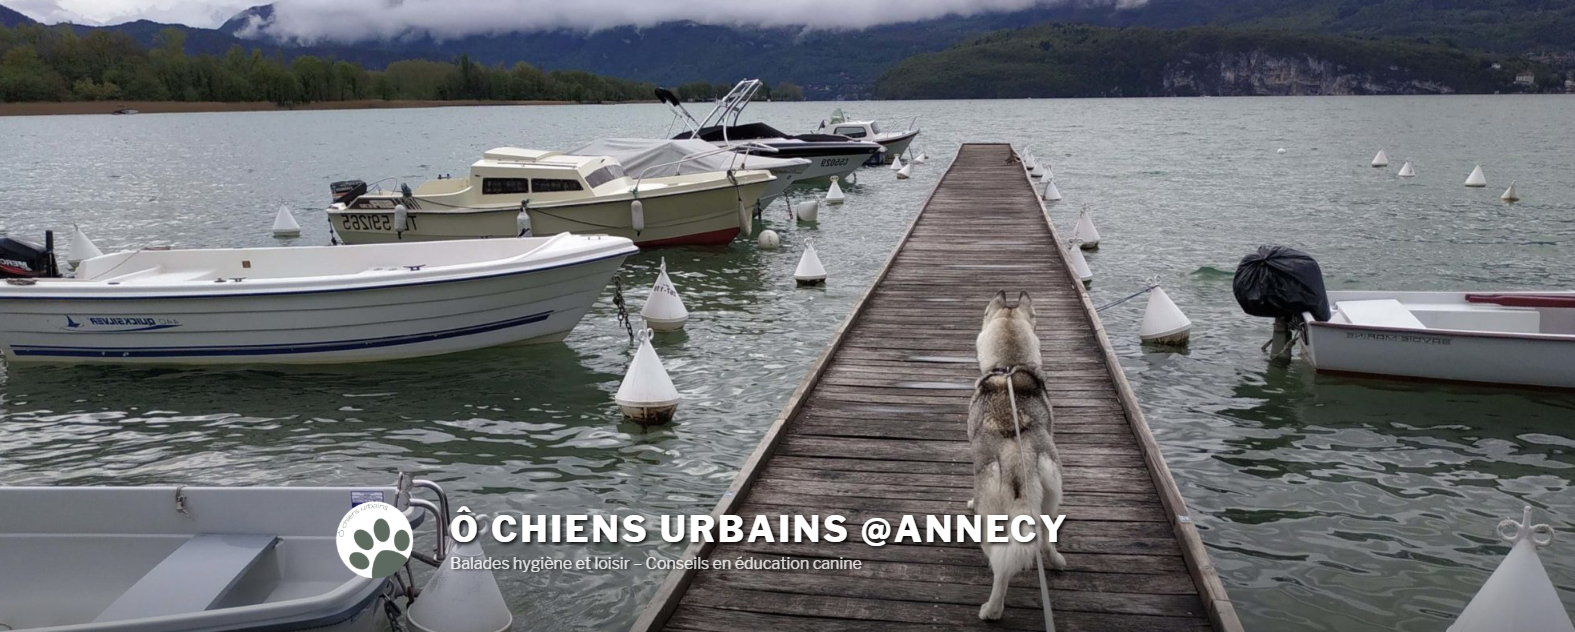 Ô Chiens Urbains – balades canines, conseils